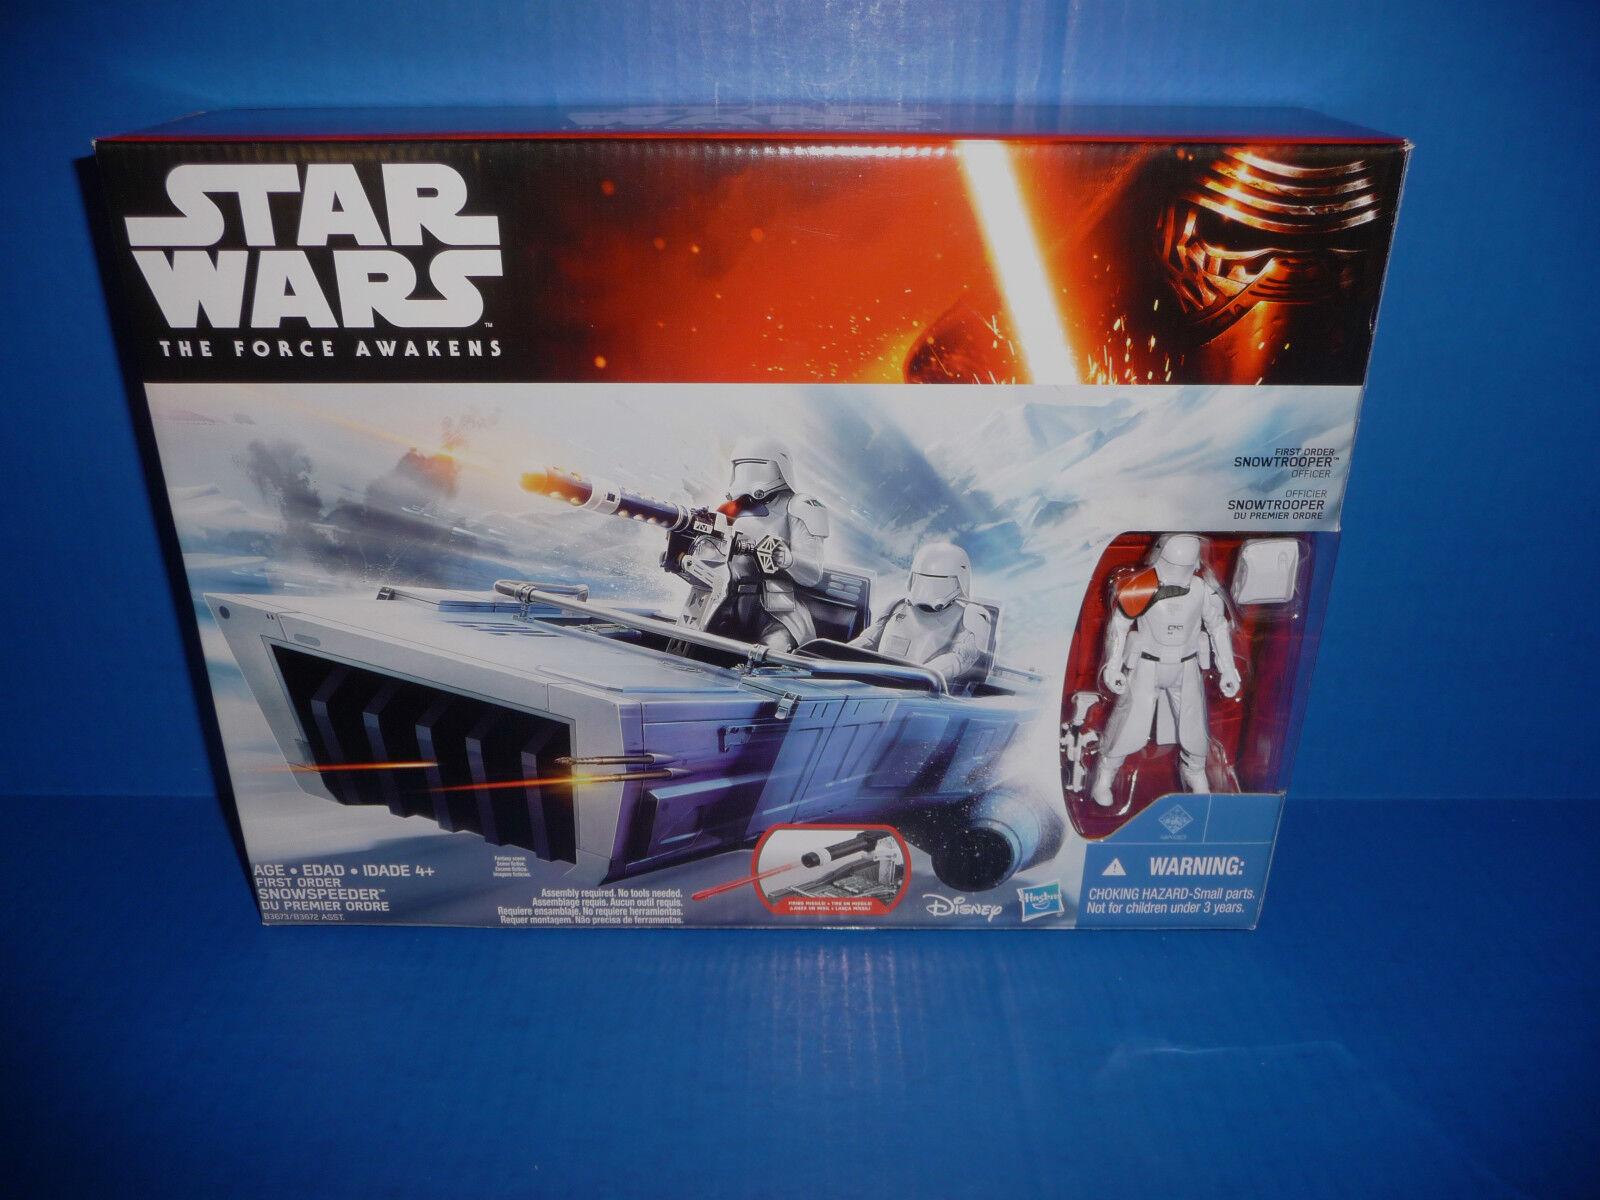 Star Wars The Force Awakens First Order Snowspeeder Vehicle & Snowtrooper Figure